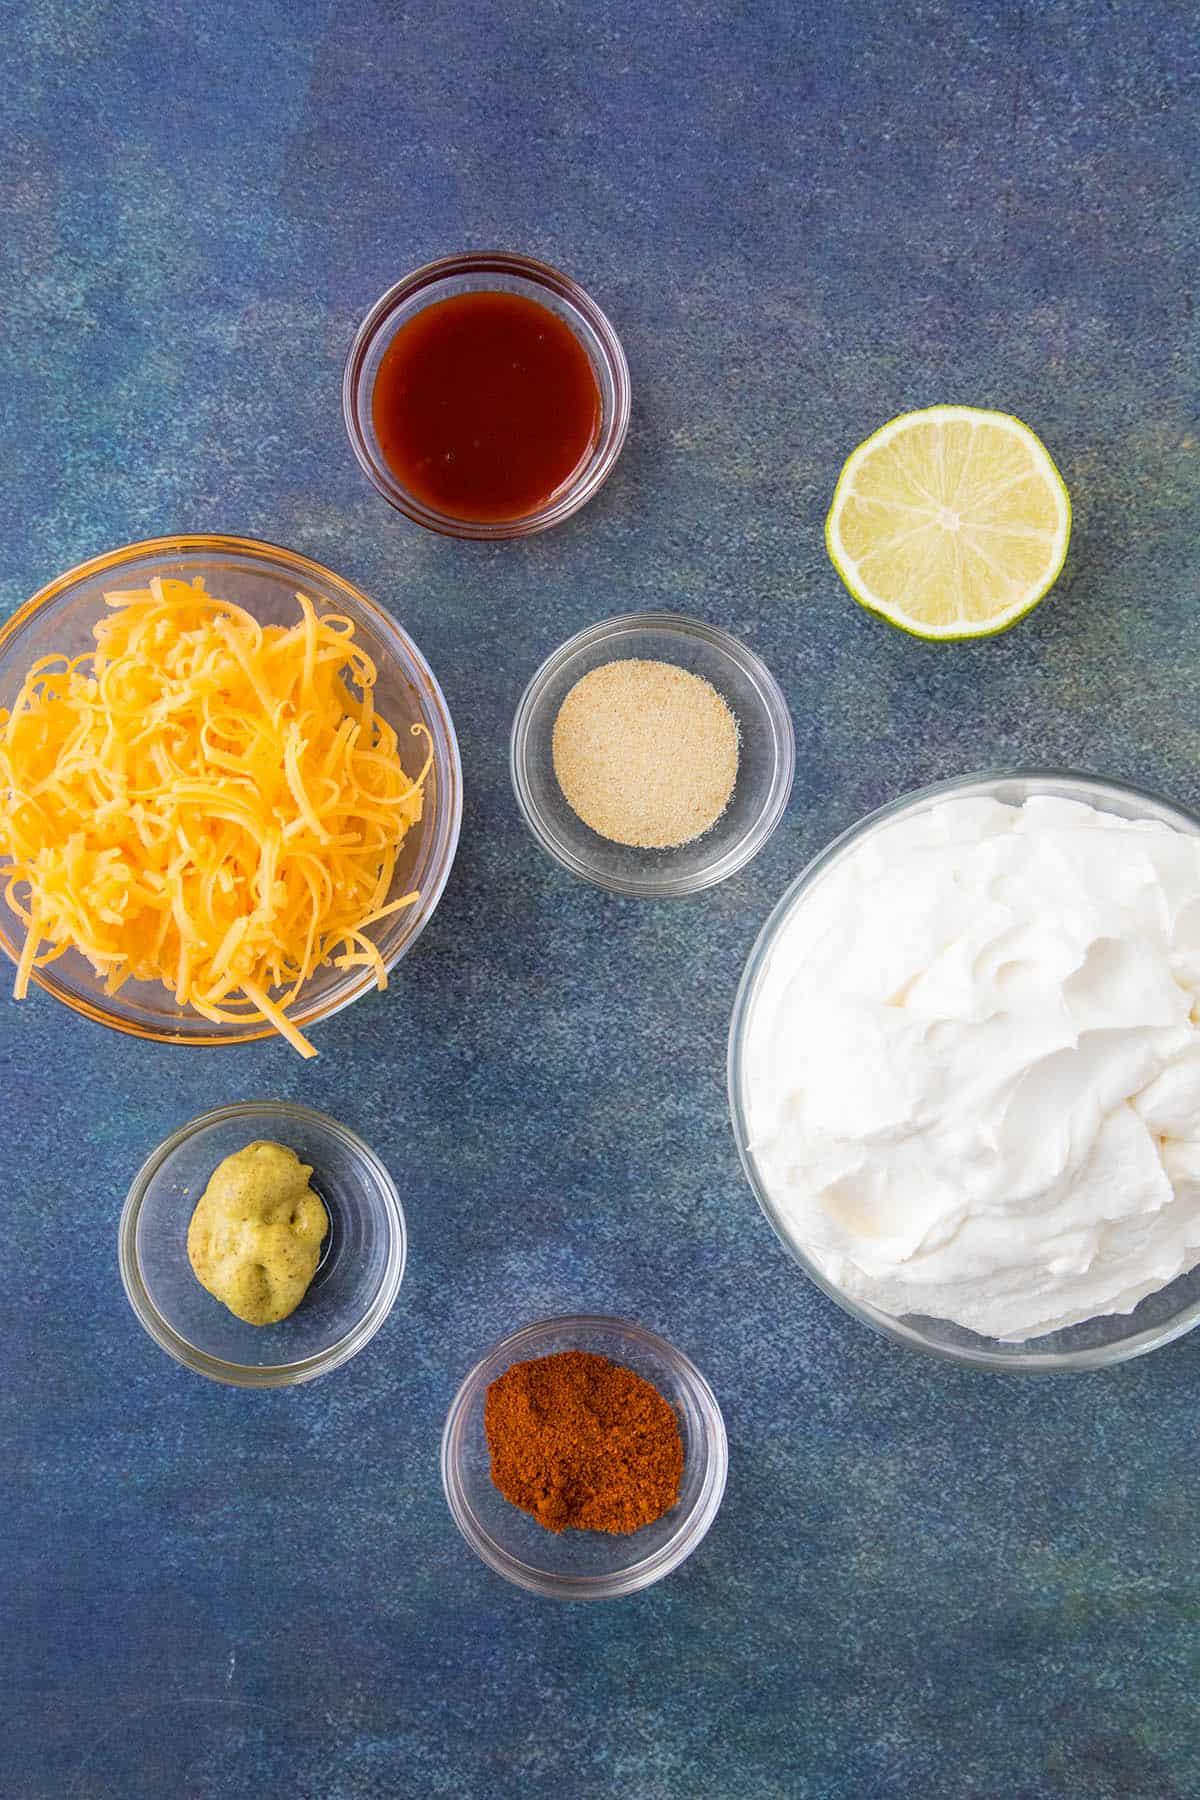 Sour Cream Dip Ingredients